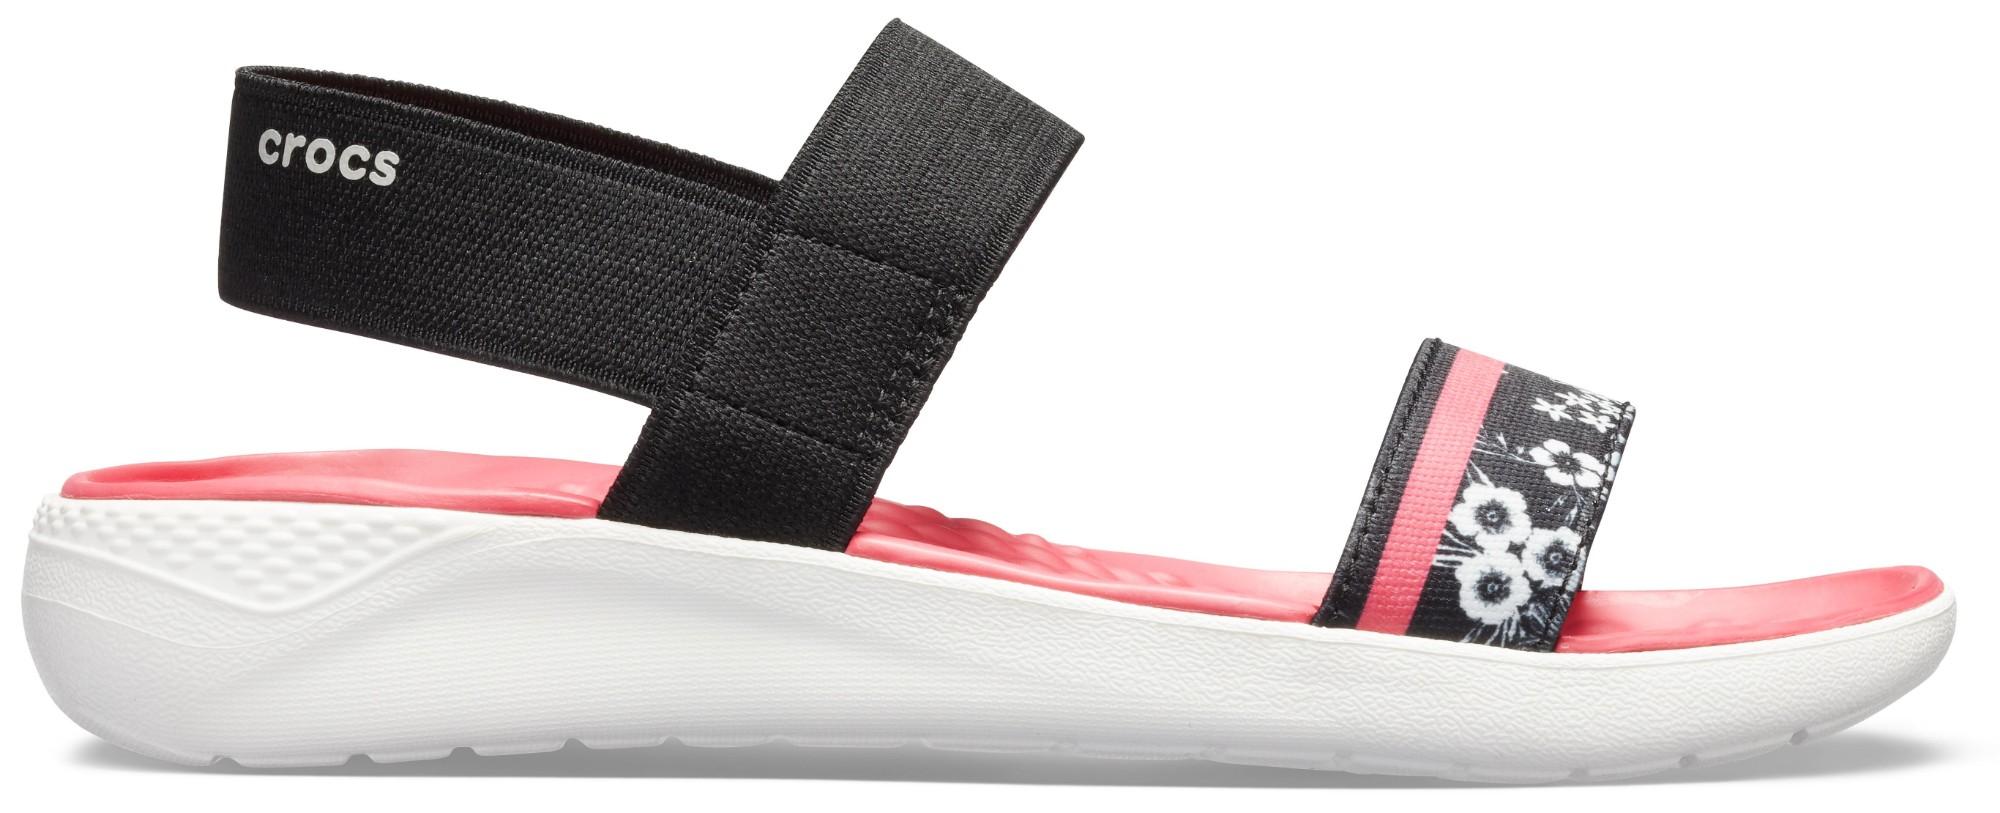 Crocs™ LiteRide Hyper Floral Sandal Women's Black/White 39,5